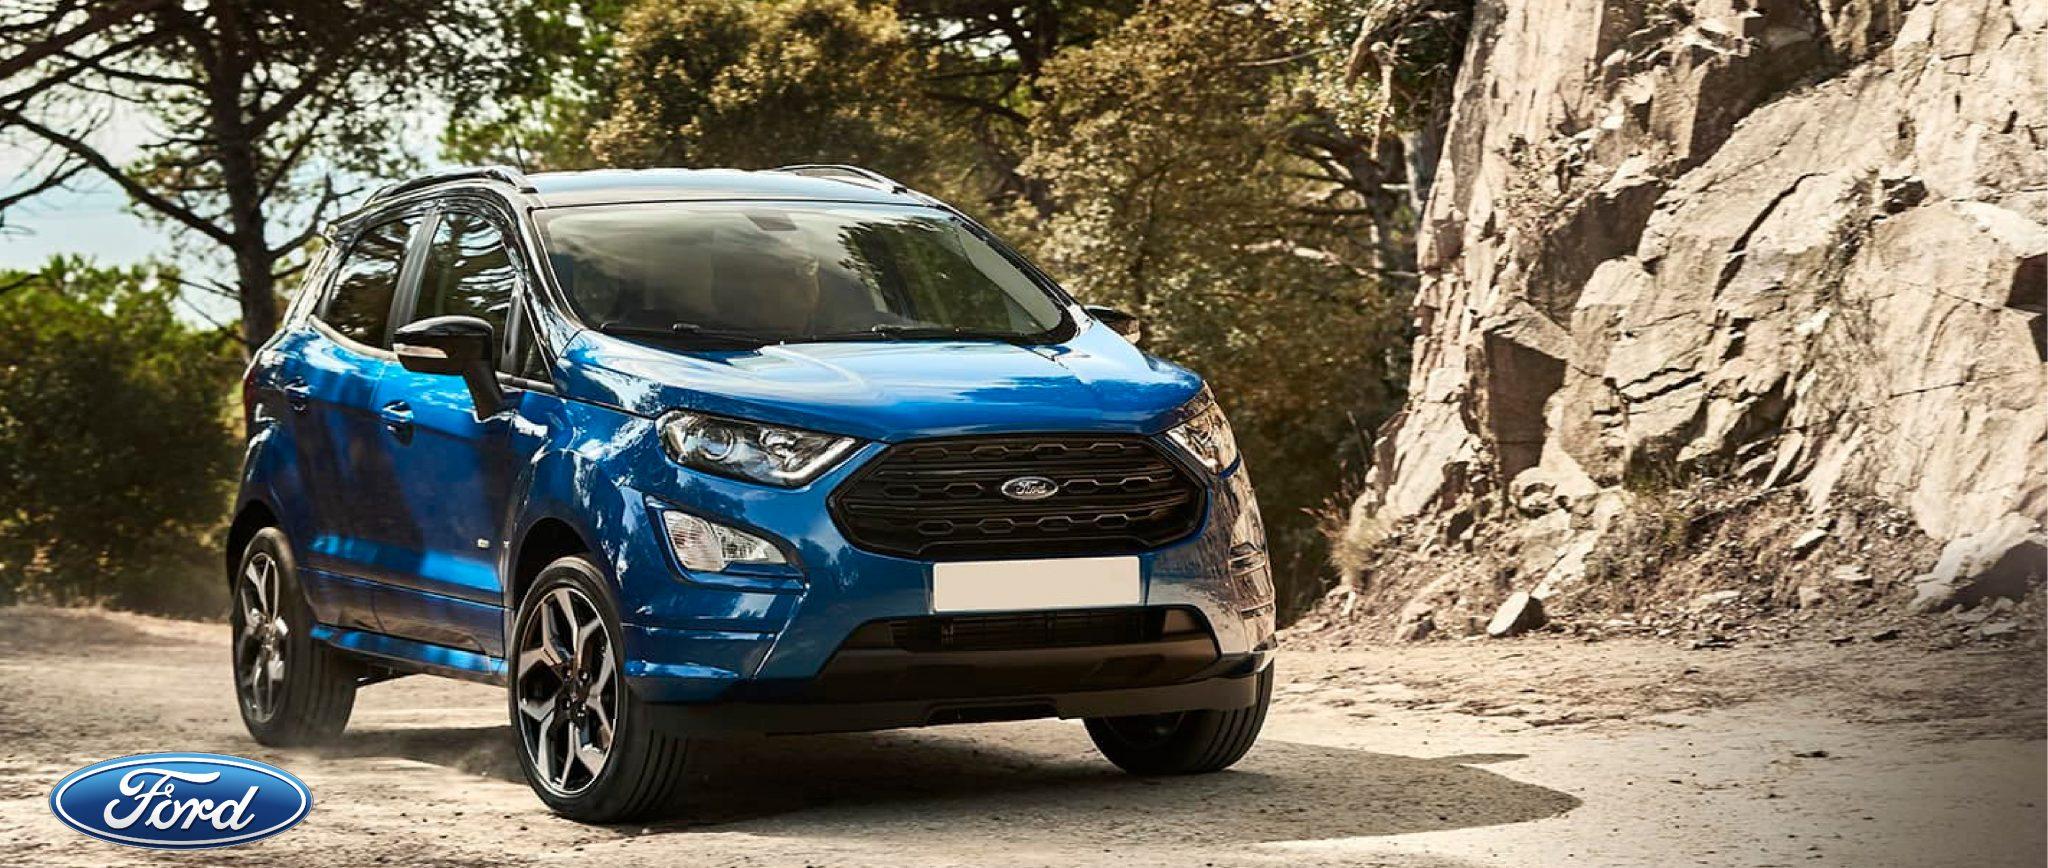 Taller mecánico para Ford